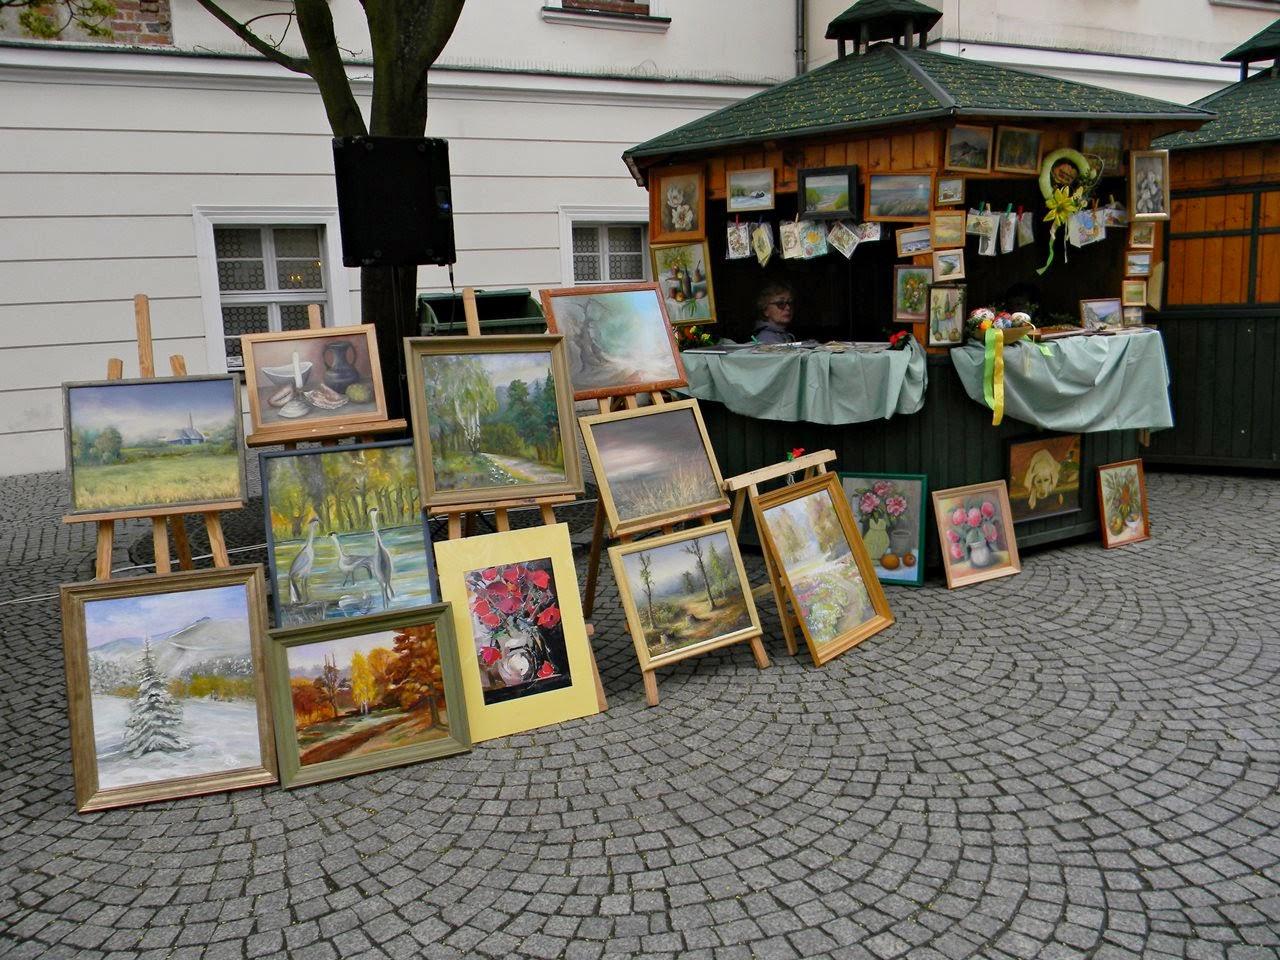 sztuka, jarmark, Zielona Góra, deptak